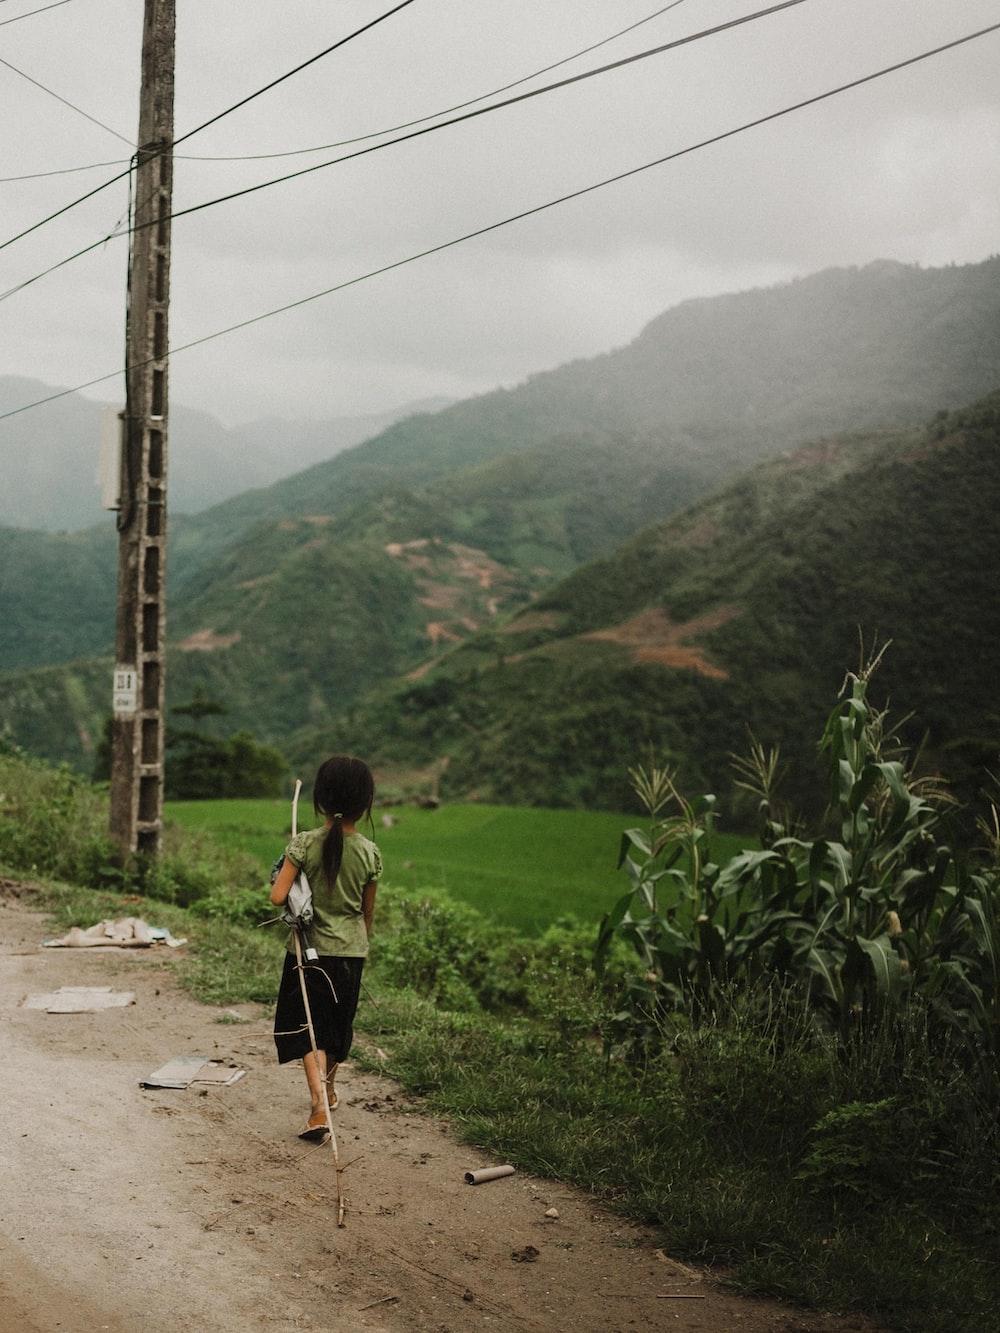 girl walking along rough road with mountain view